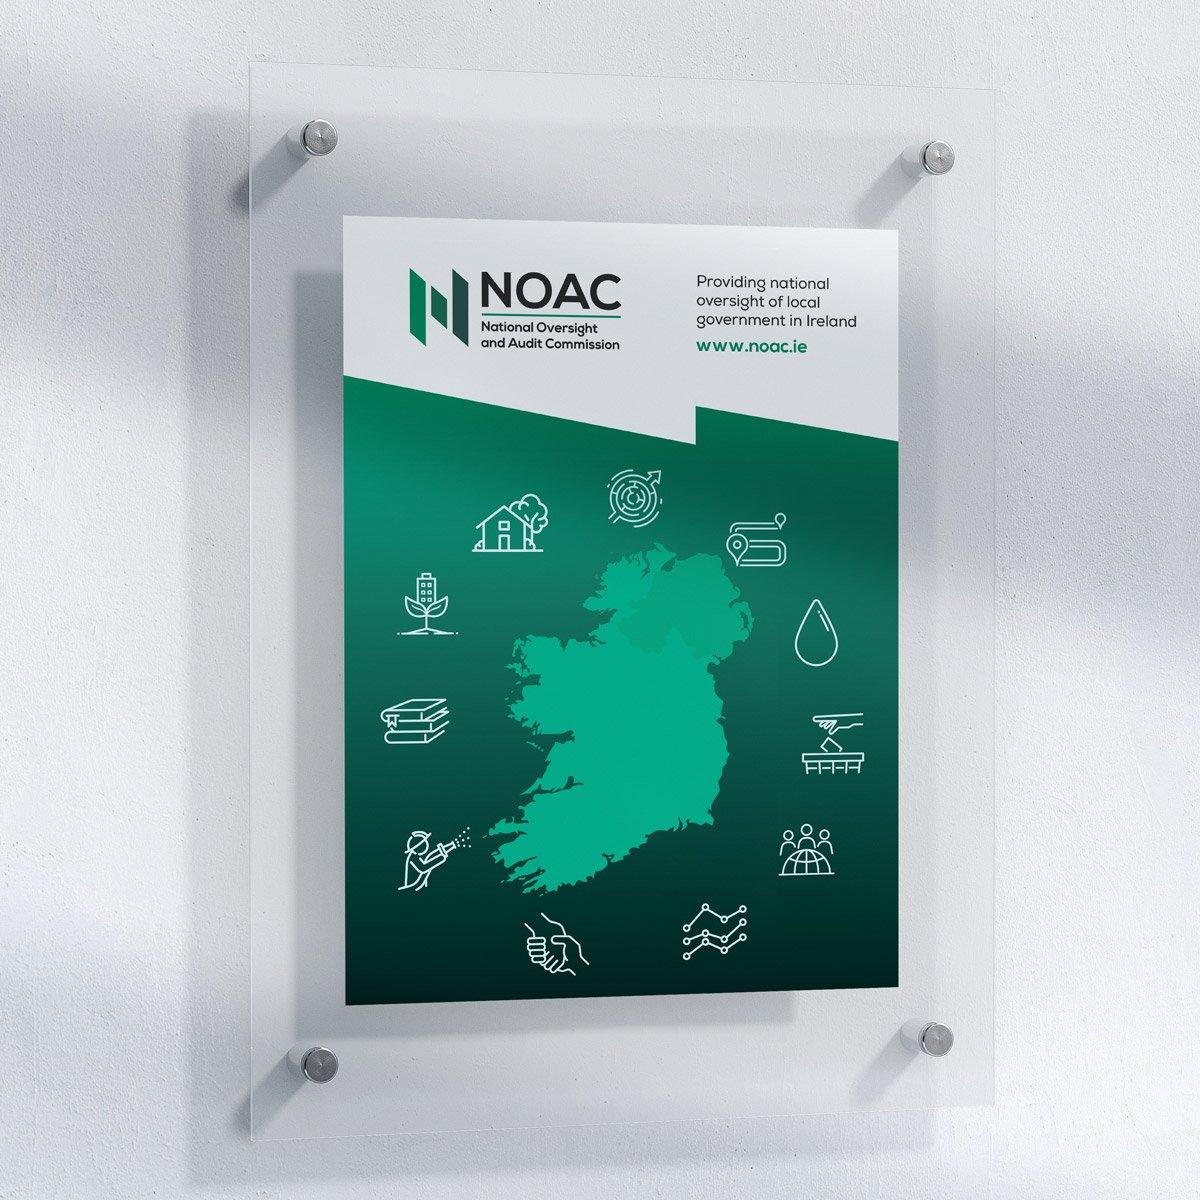 noac poster design